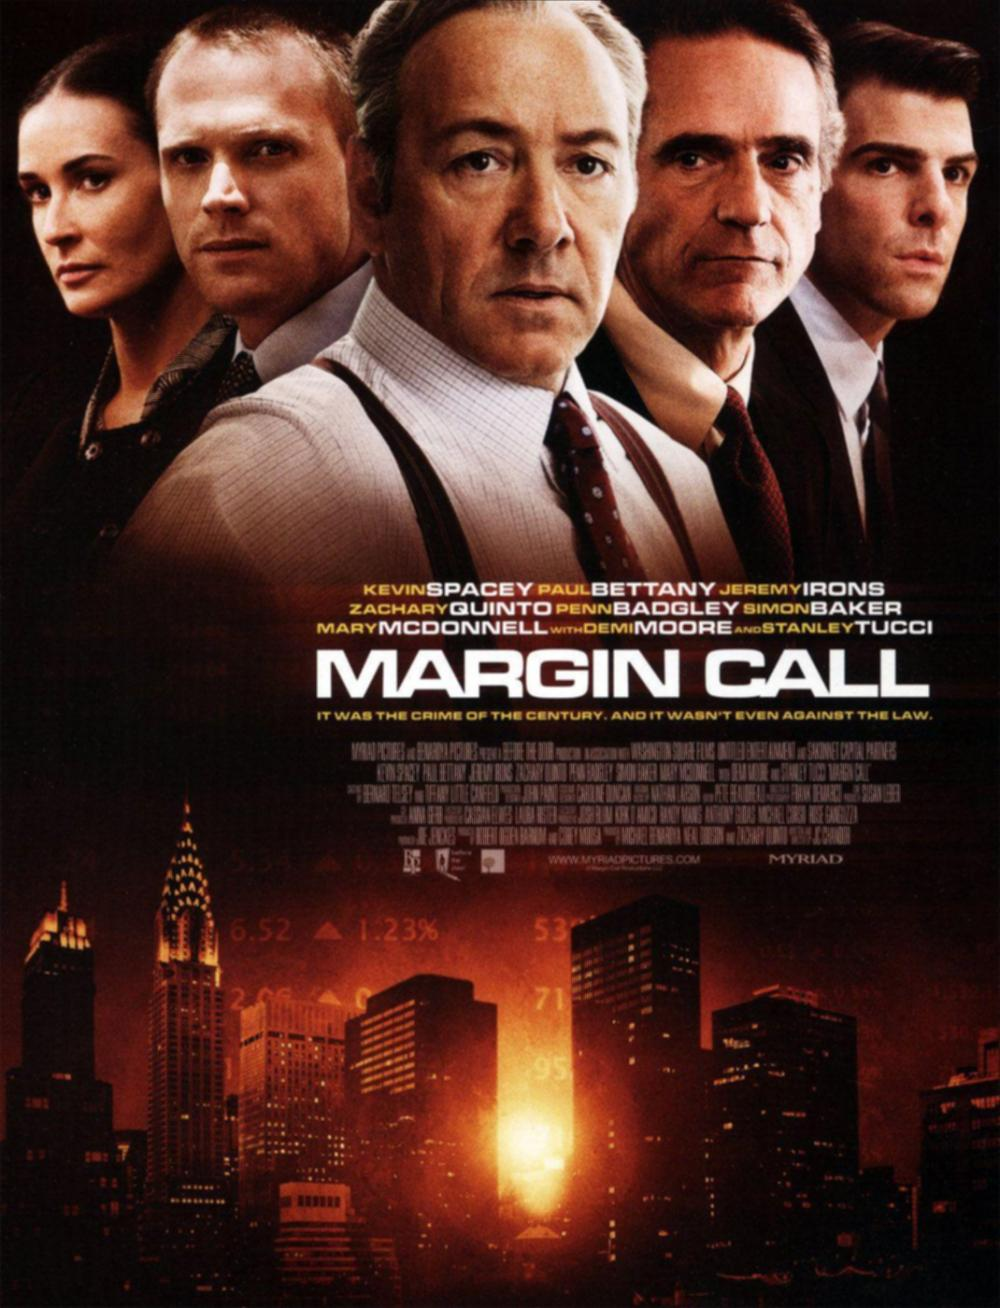 Der Große Crash - Margin Call Stream